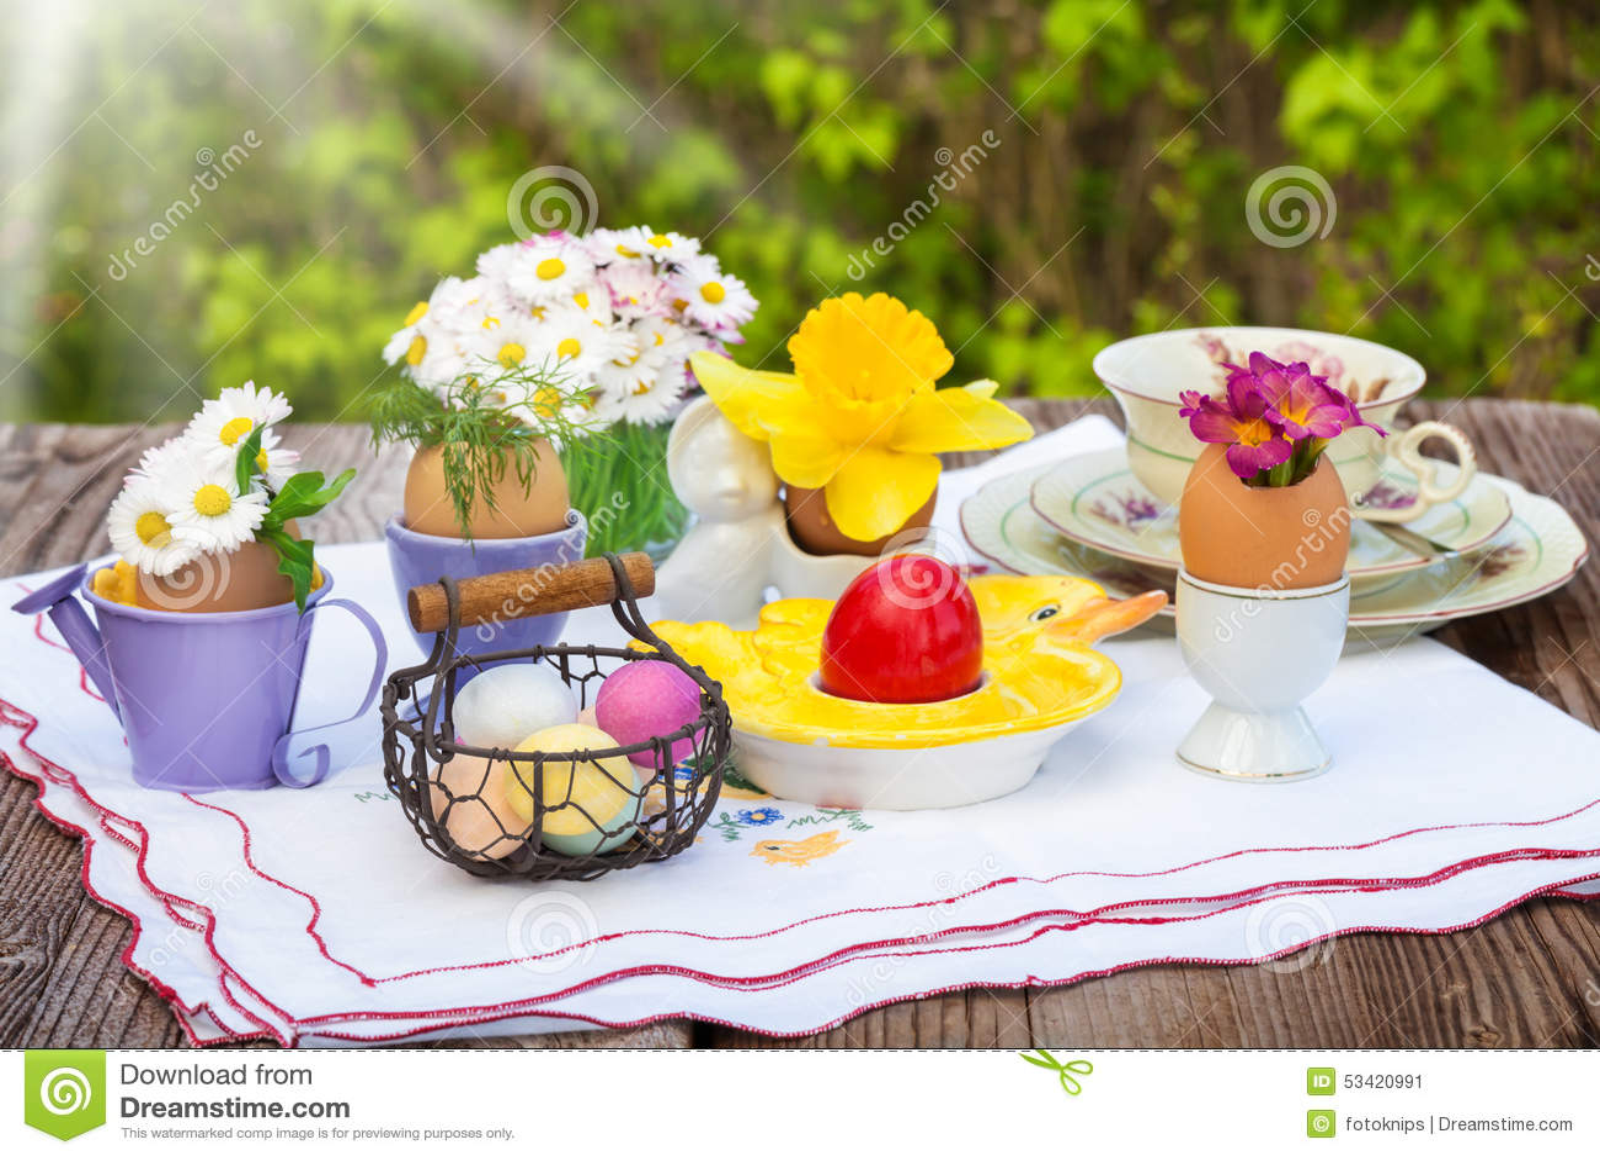 Samedi 3 avril Petit-d%C3%A9jeuner-de-p%C3%A2ques-d%C3%A9coration-de-p%C3%A2ques-53420991